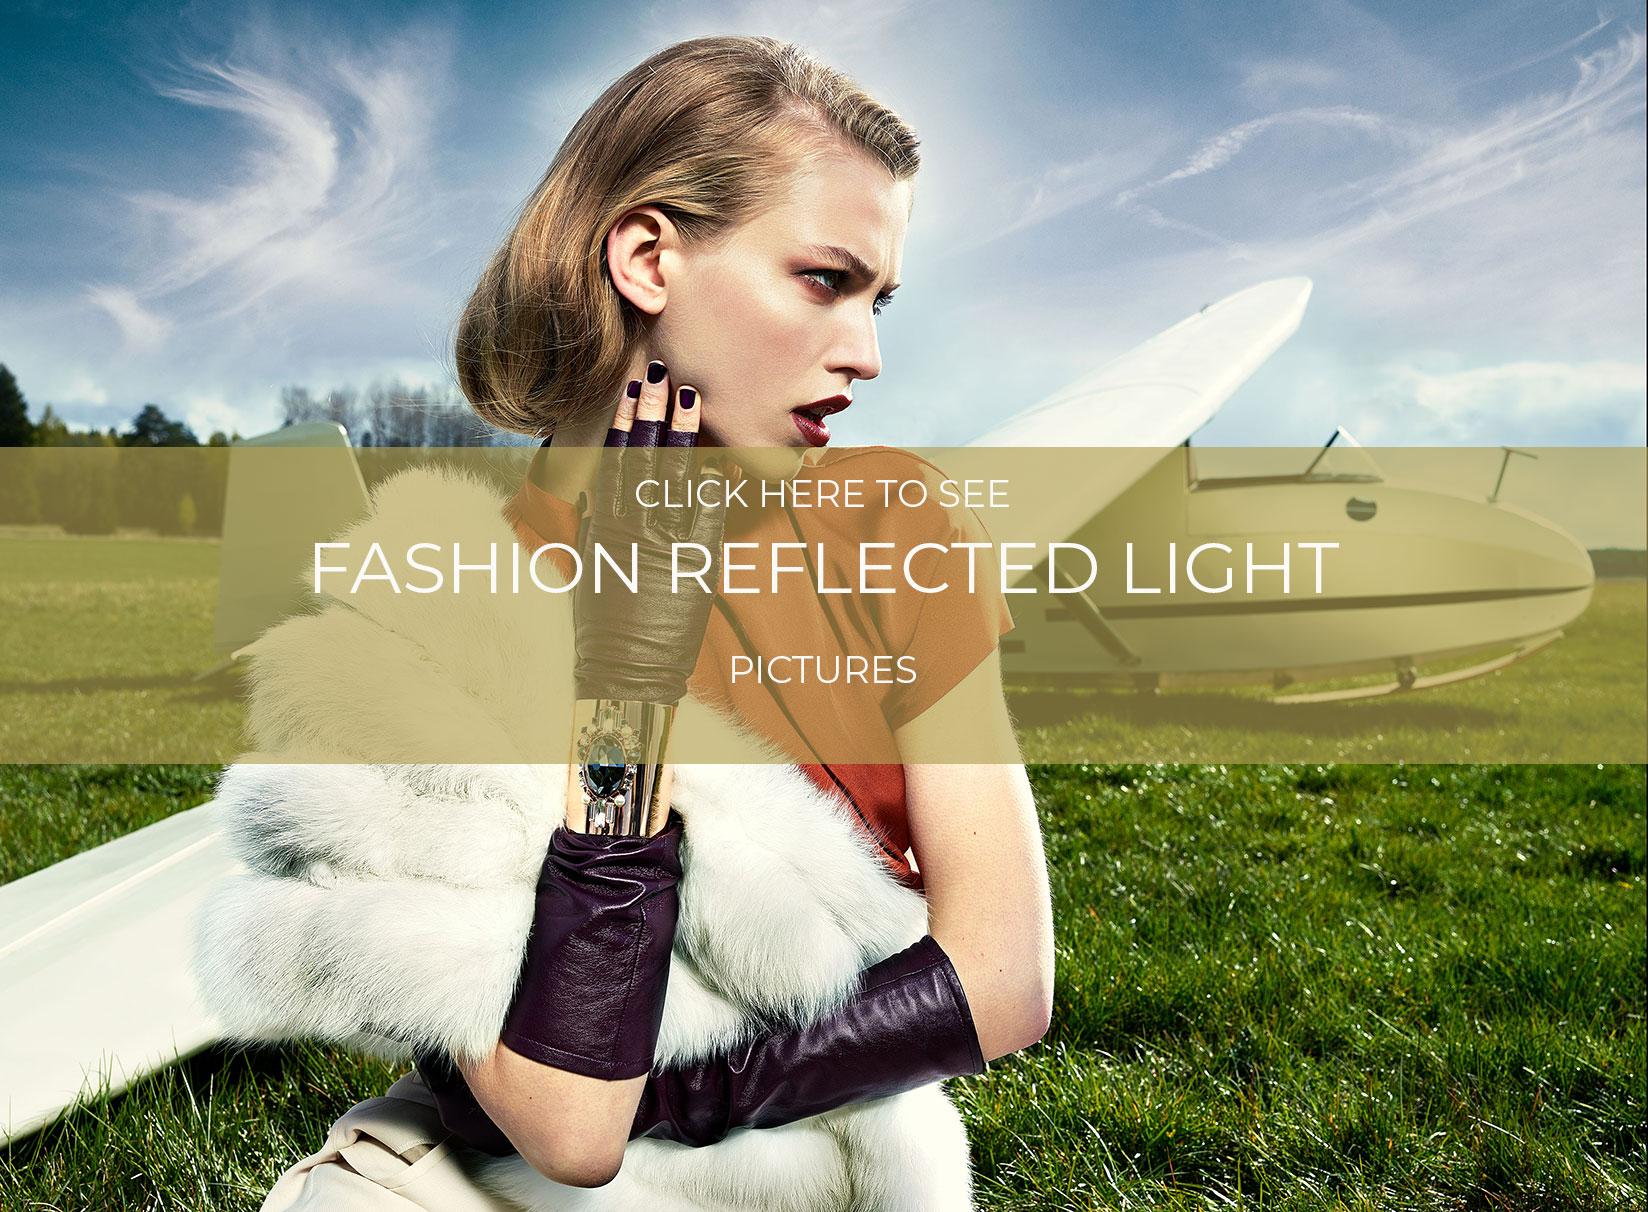 Fashion Reflected Light